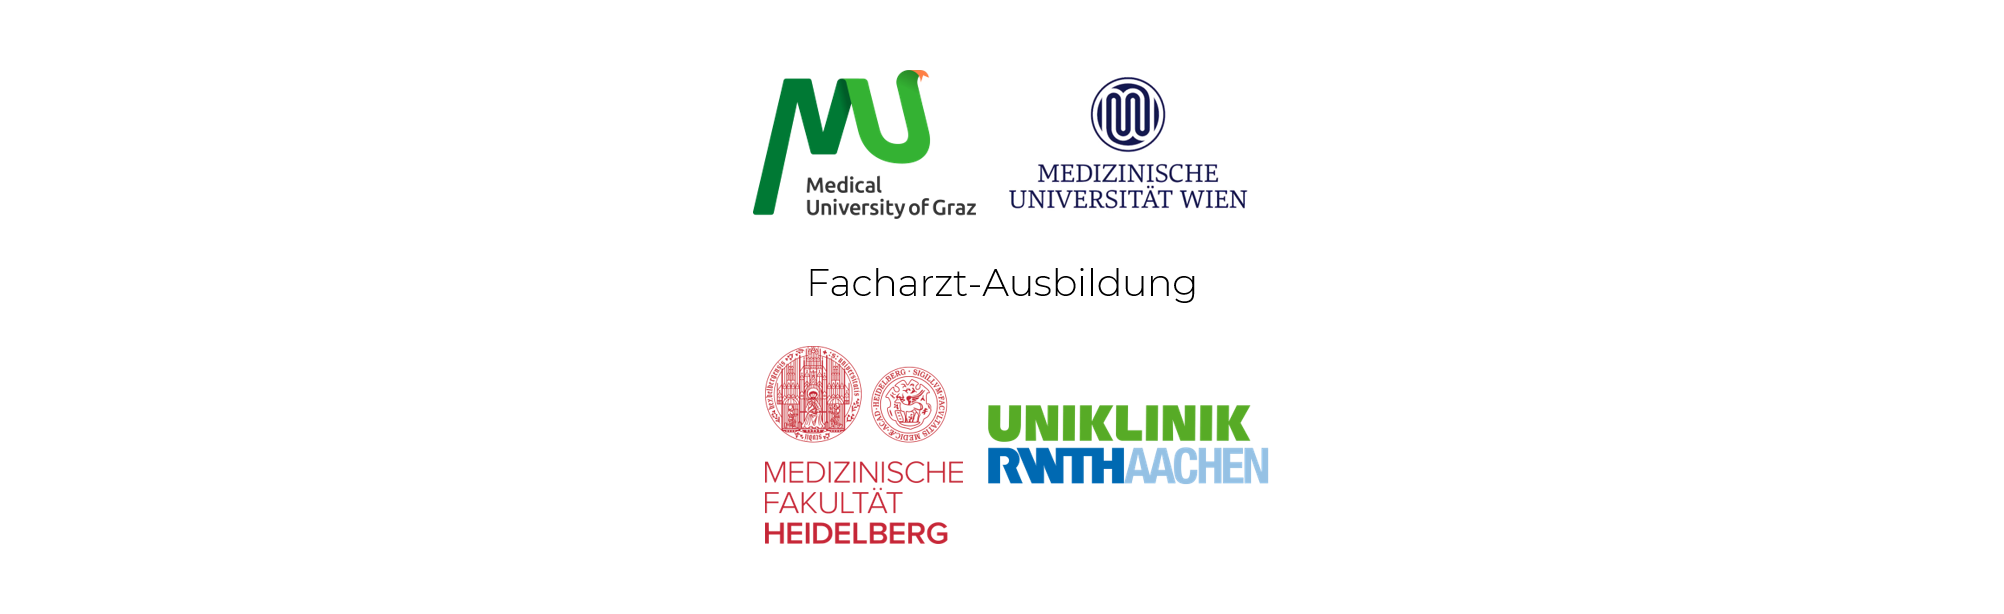 Unis Logos Text Streifen.png